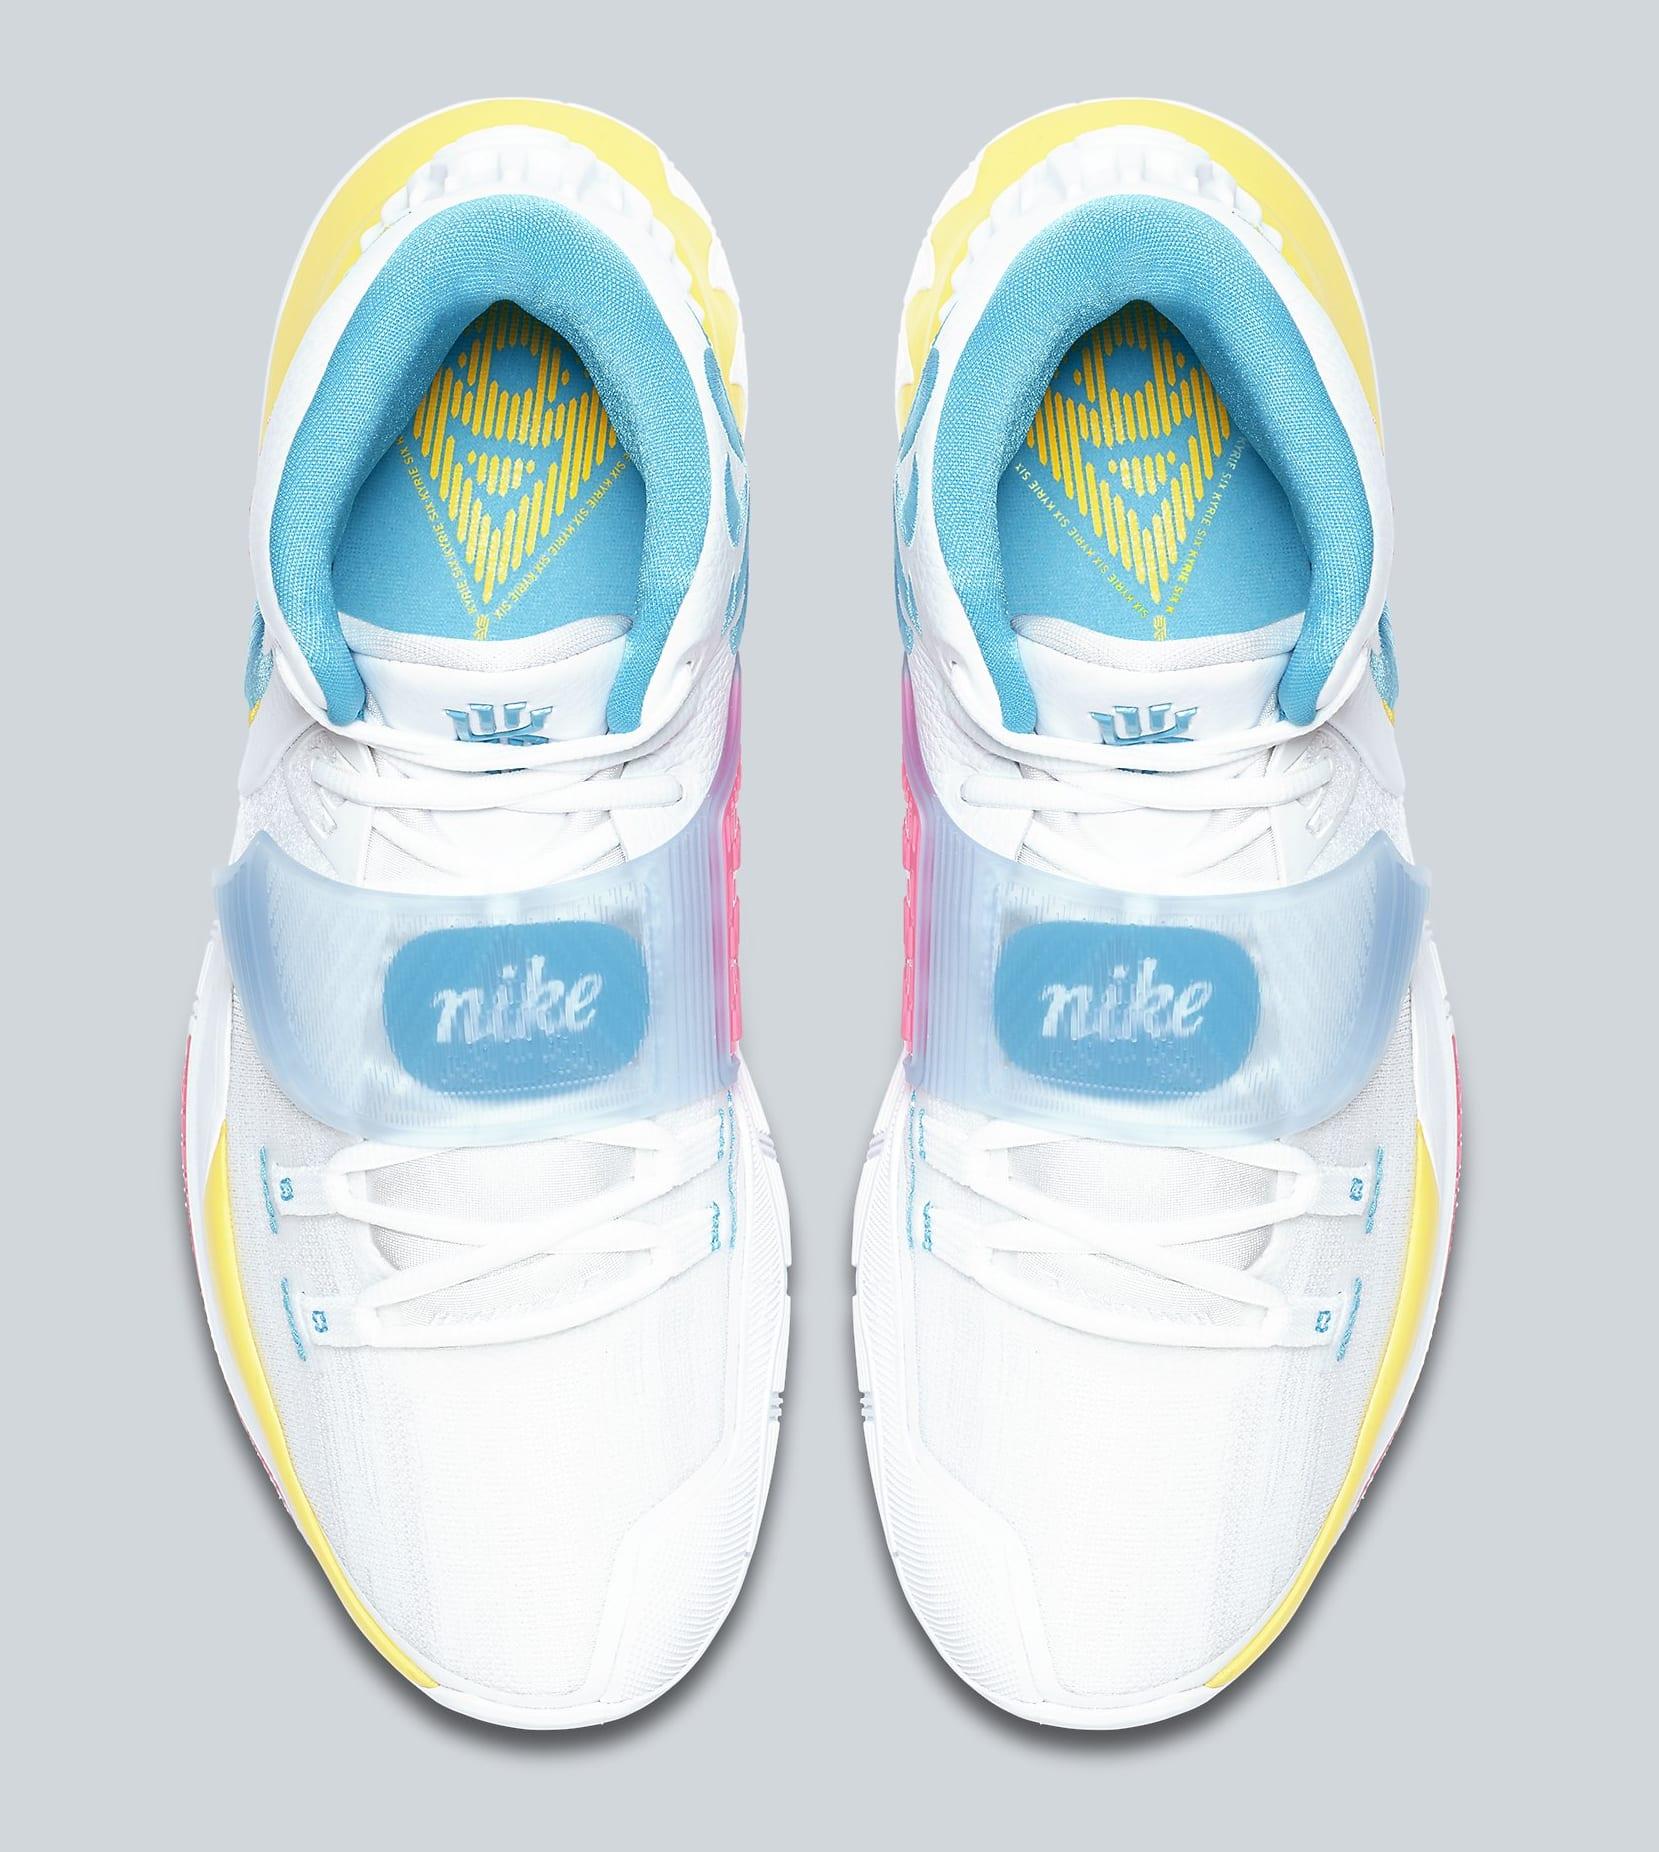 Nike Kyrie 6 'Neon Graffiti' BQ4630-101 Top